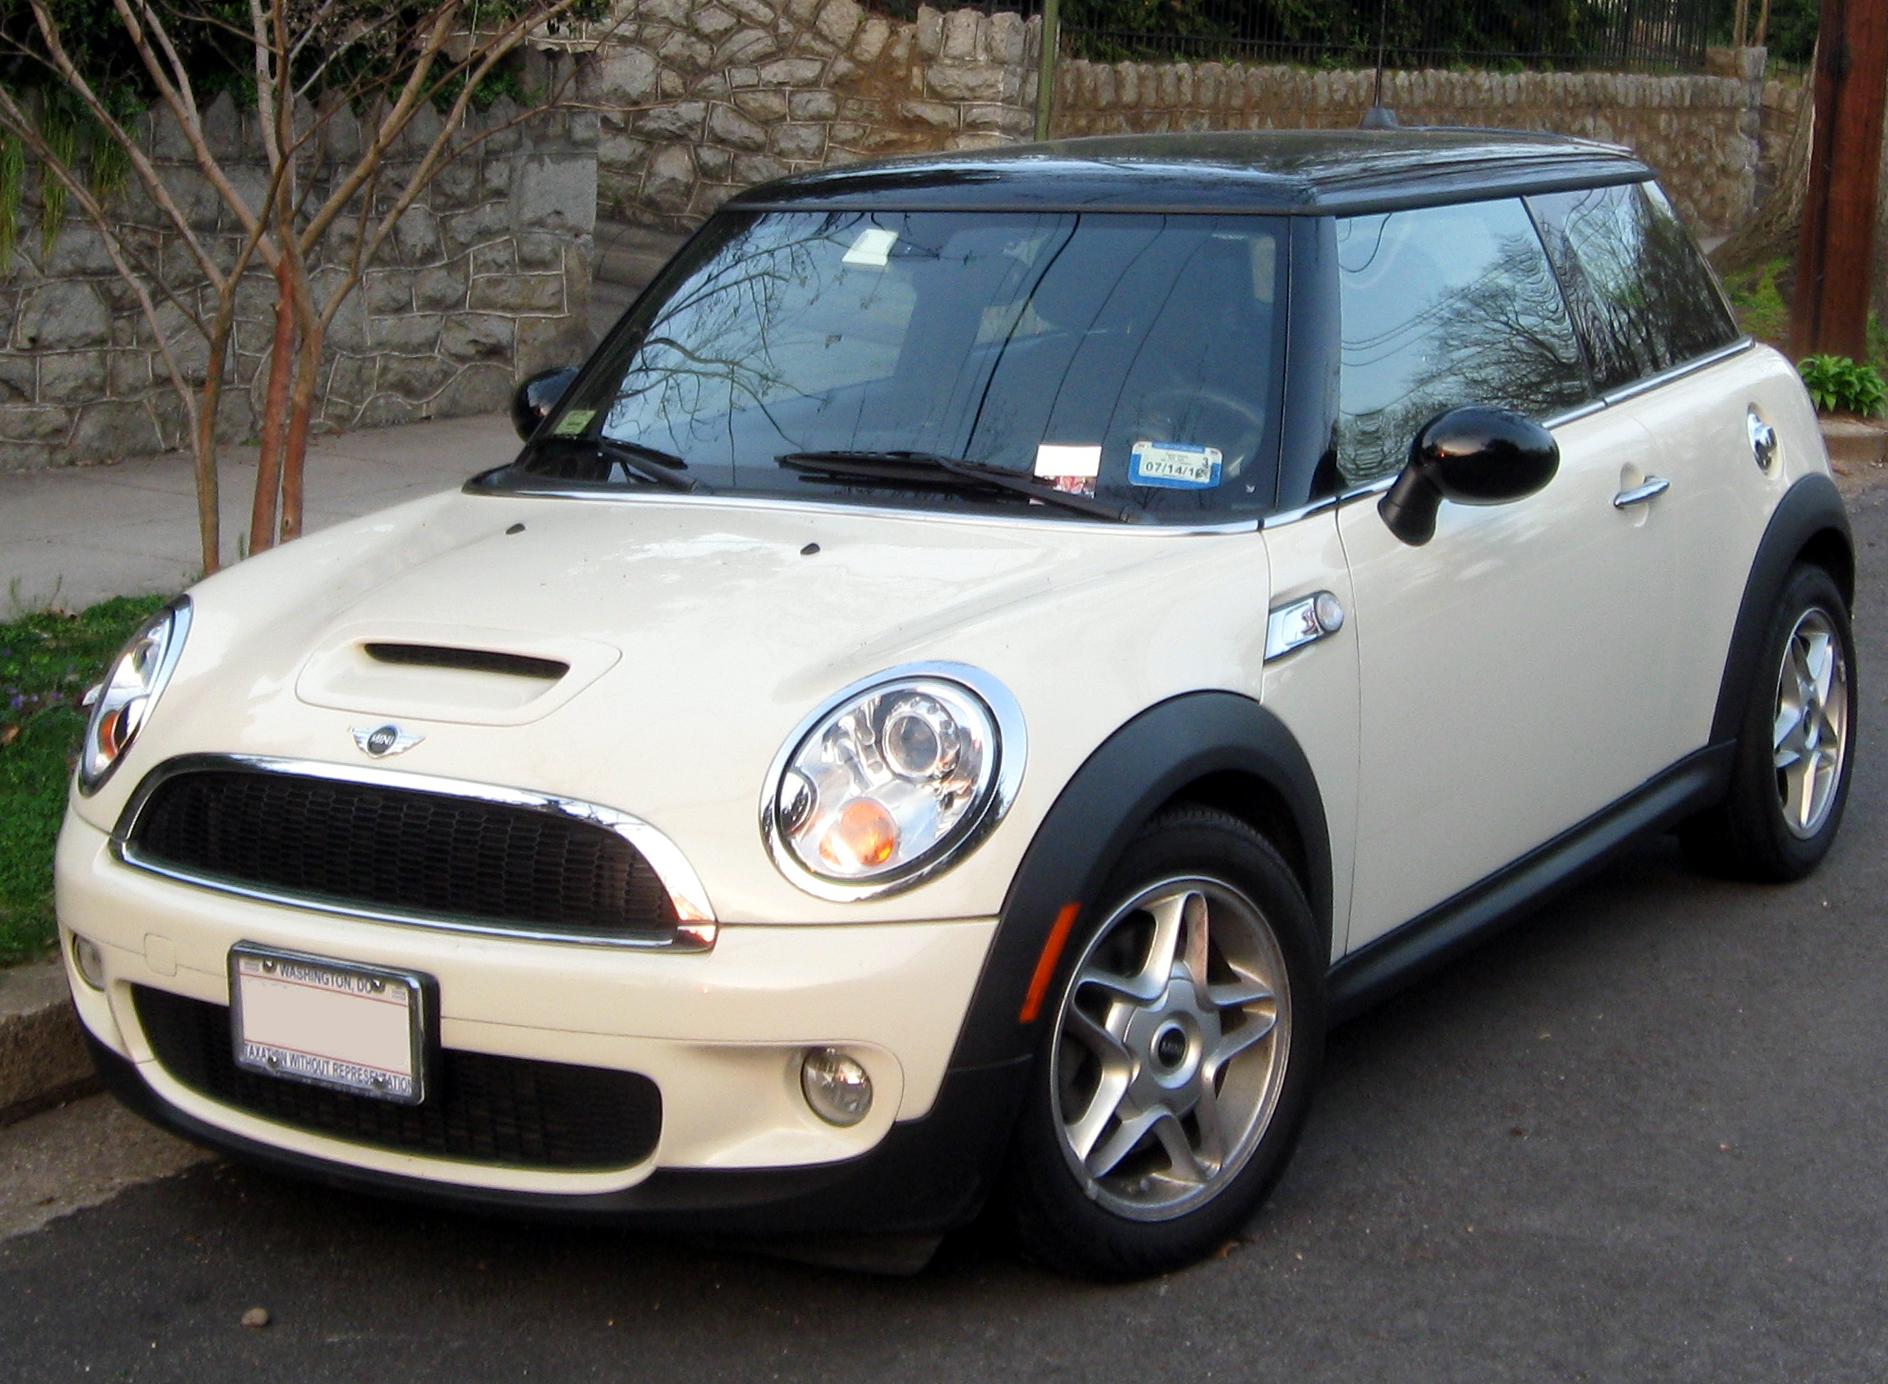 Mini Cooper Usa >> File:2nd Mini Cooper S -- 03-21-2012.JPG - Wikimedia Commons